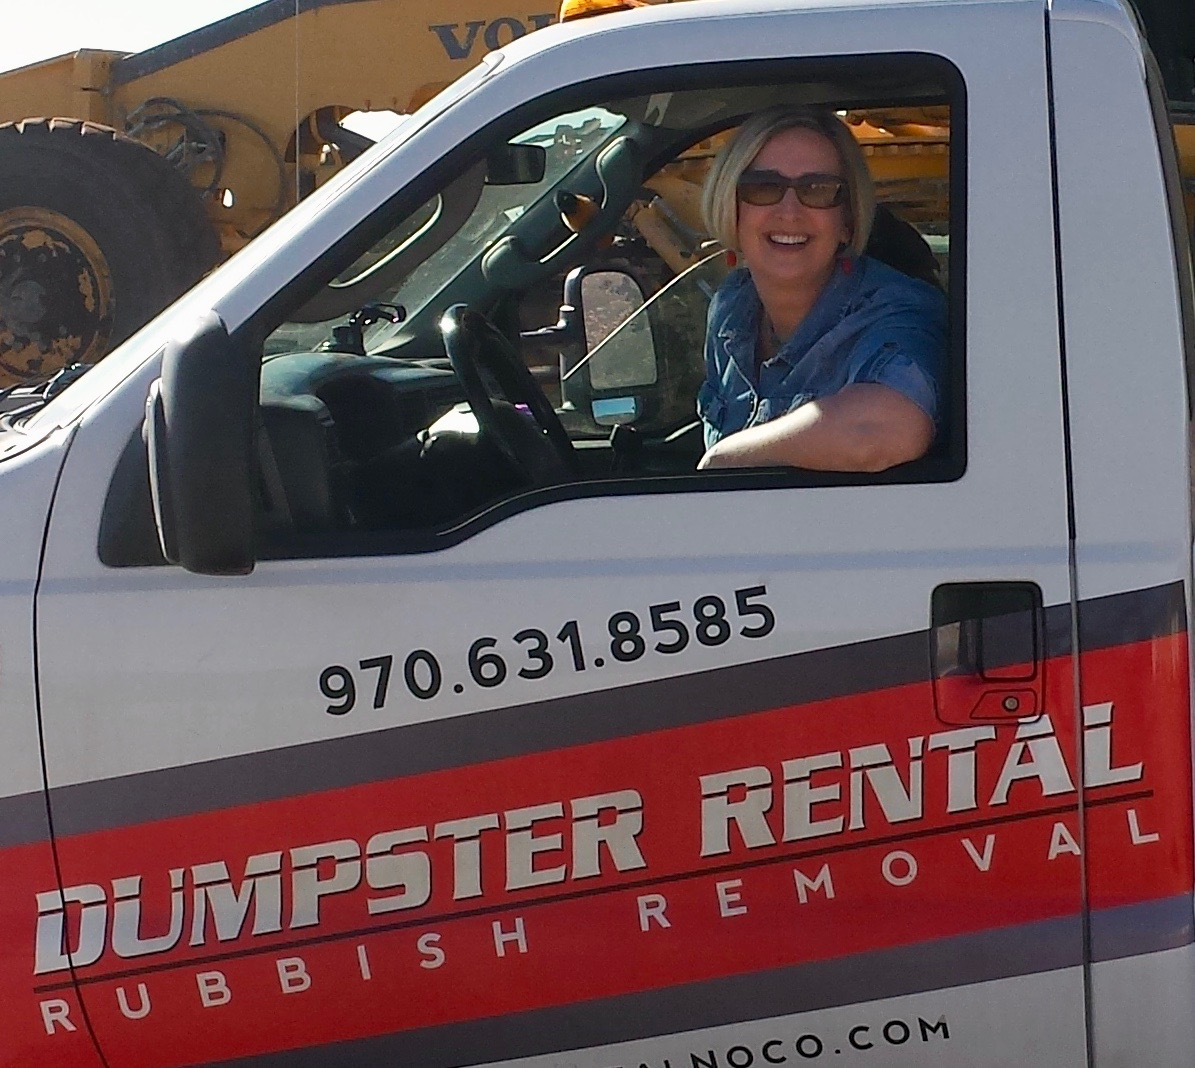 local dumpster rental